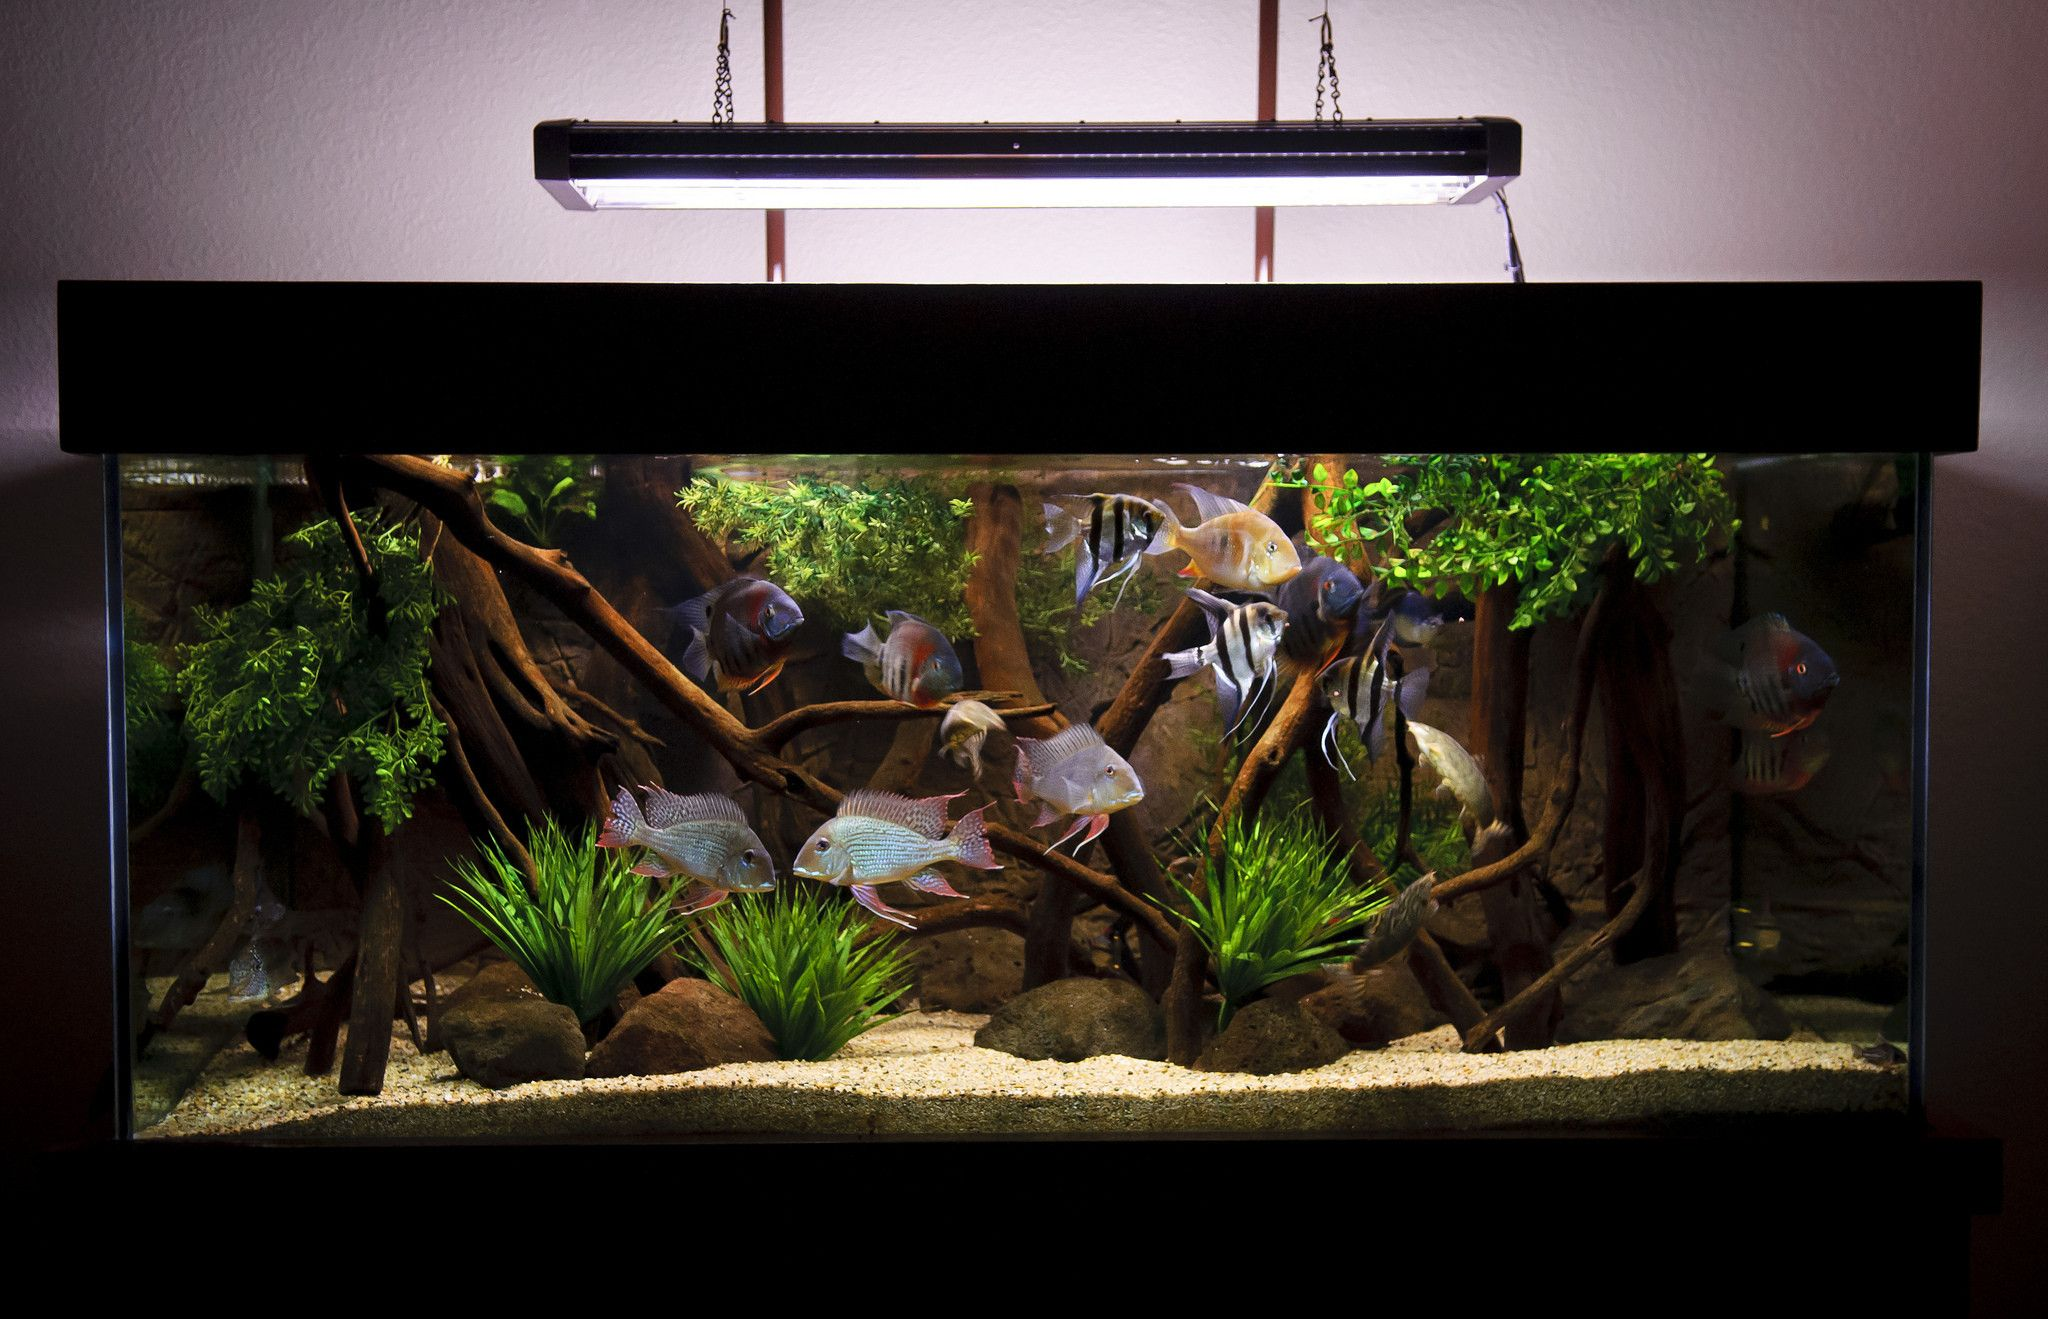 Freshwater aquarium fish info - Diy 190g Cichlid Biotope Tank